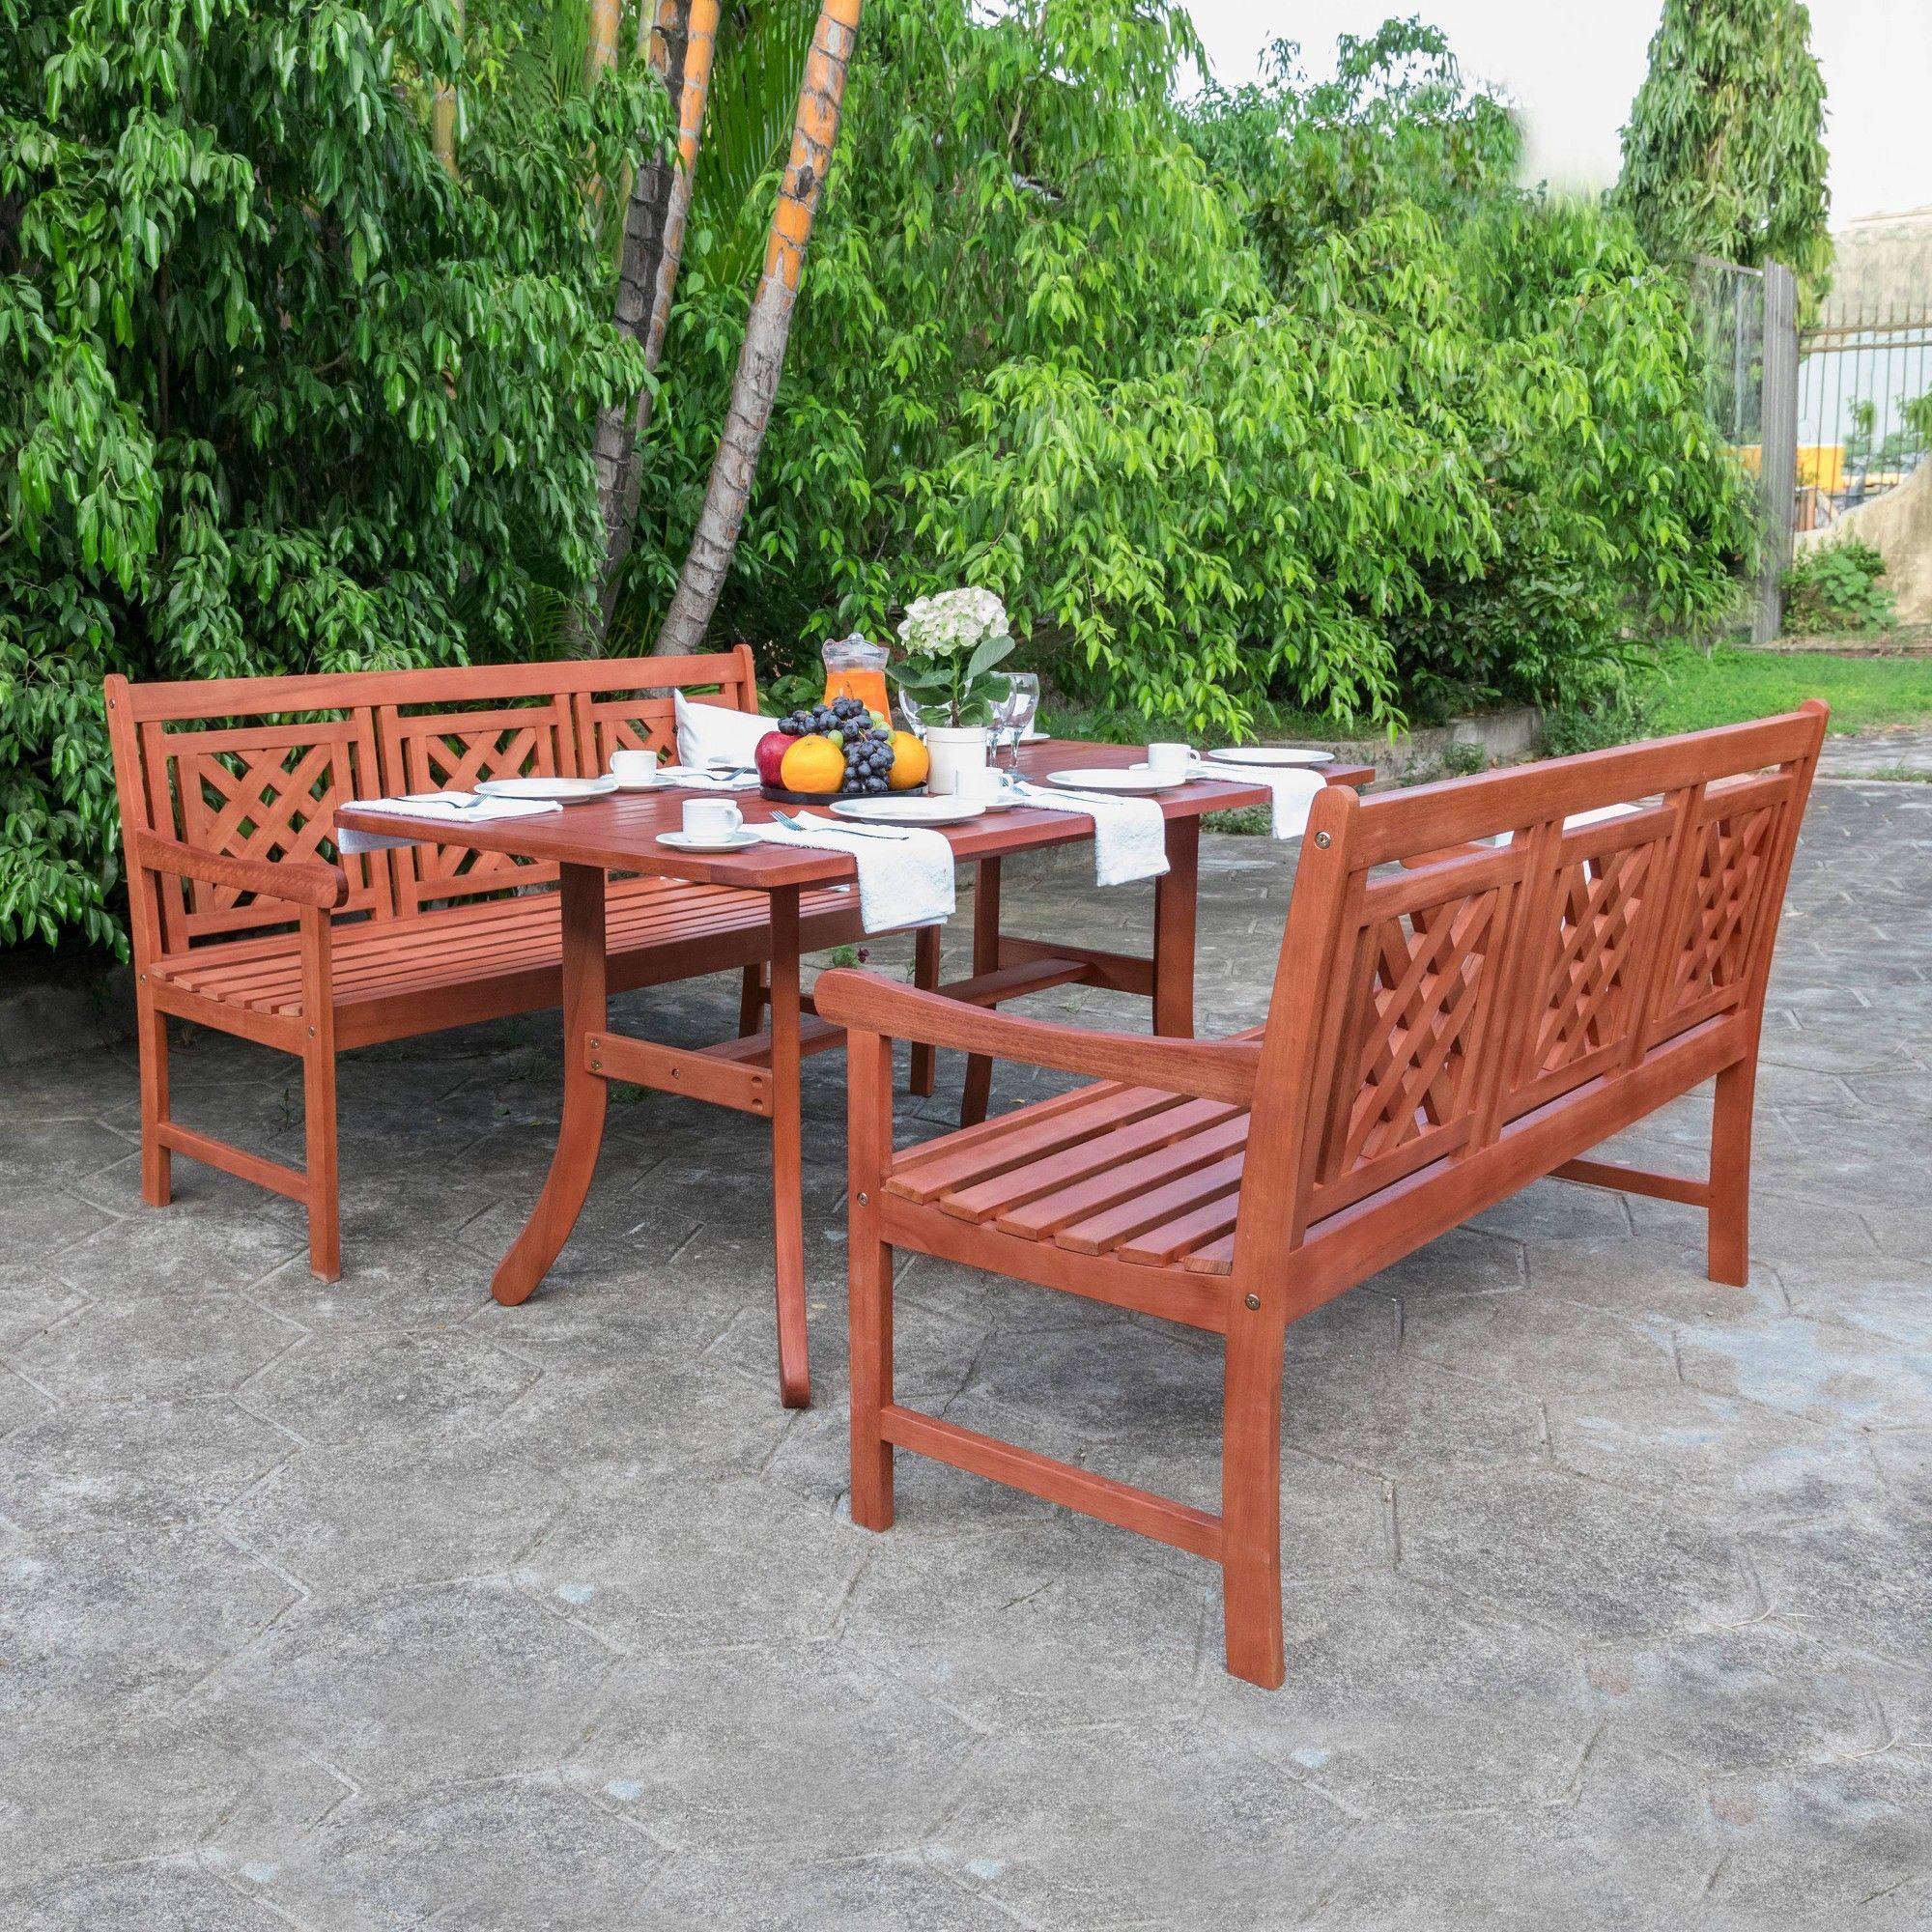 Vifah Patio Furniture.Malibu 3pc Wood Outdoor Patio Dining Set Tan Vifah In 2019